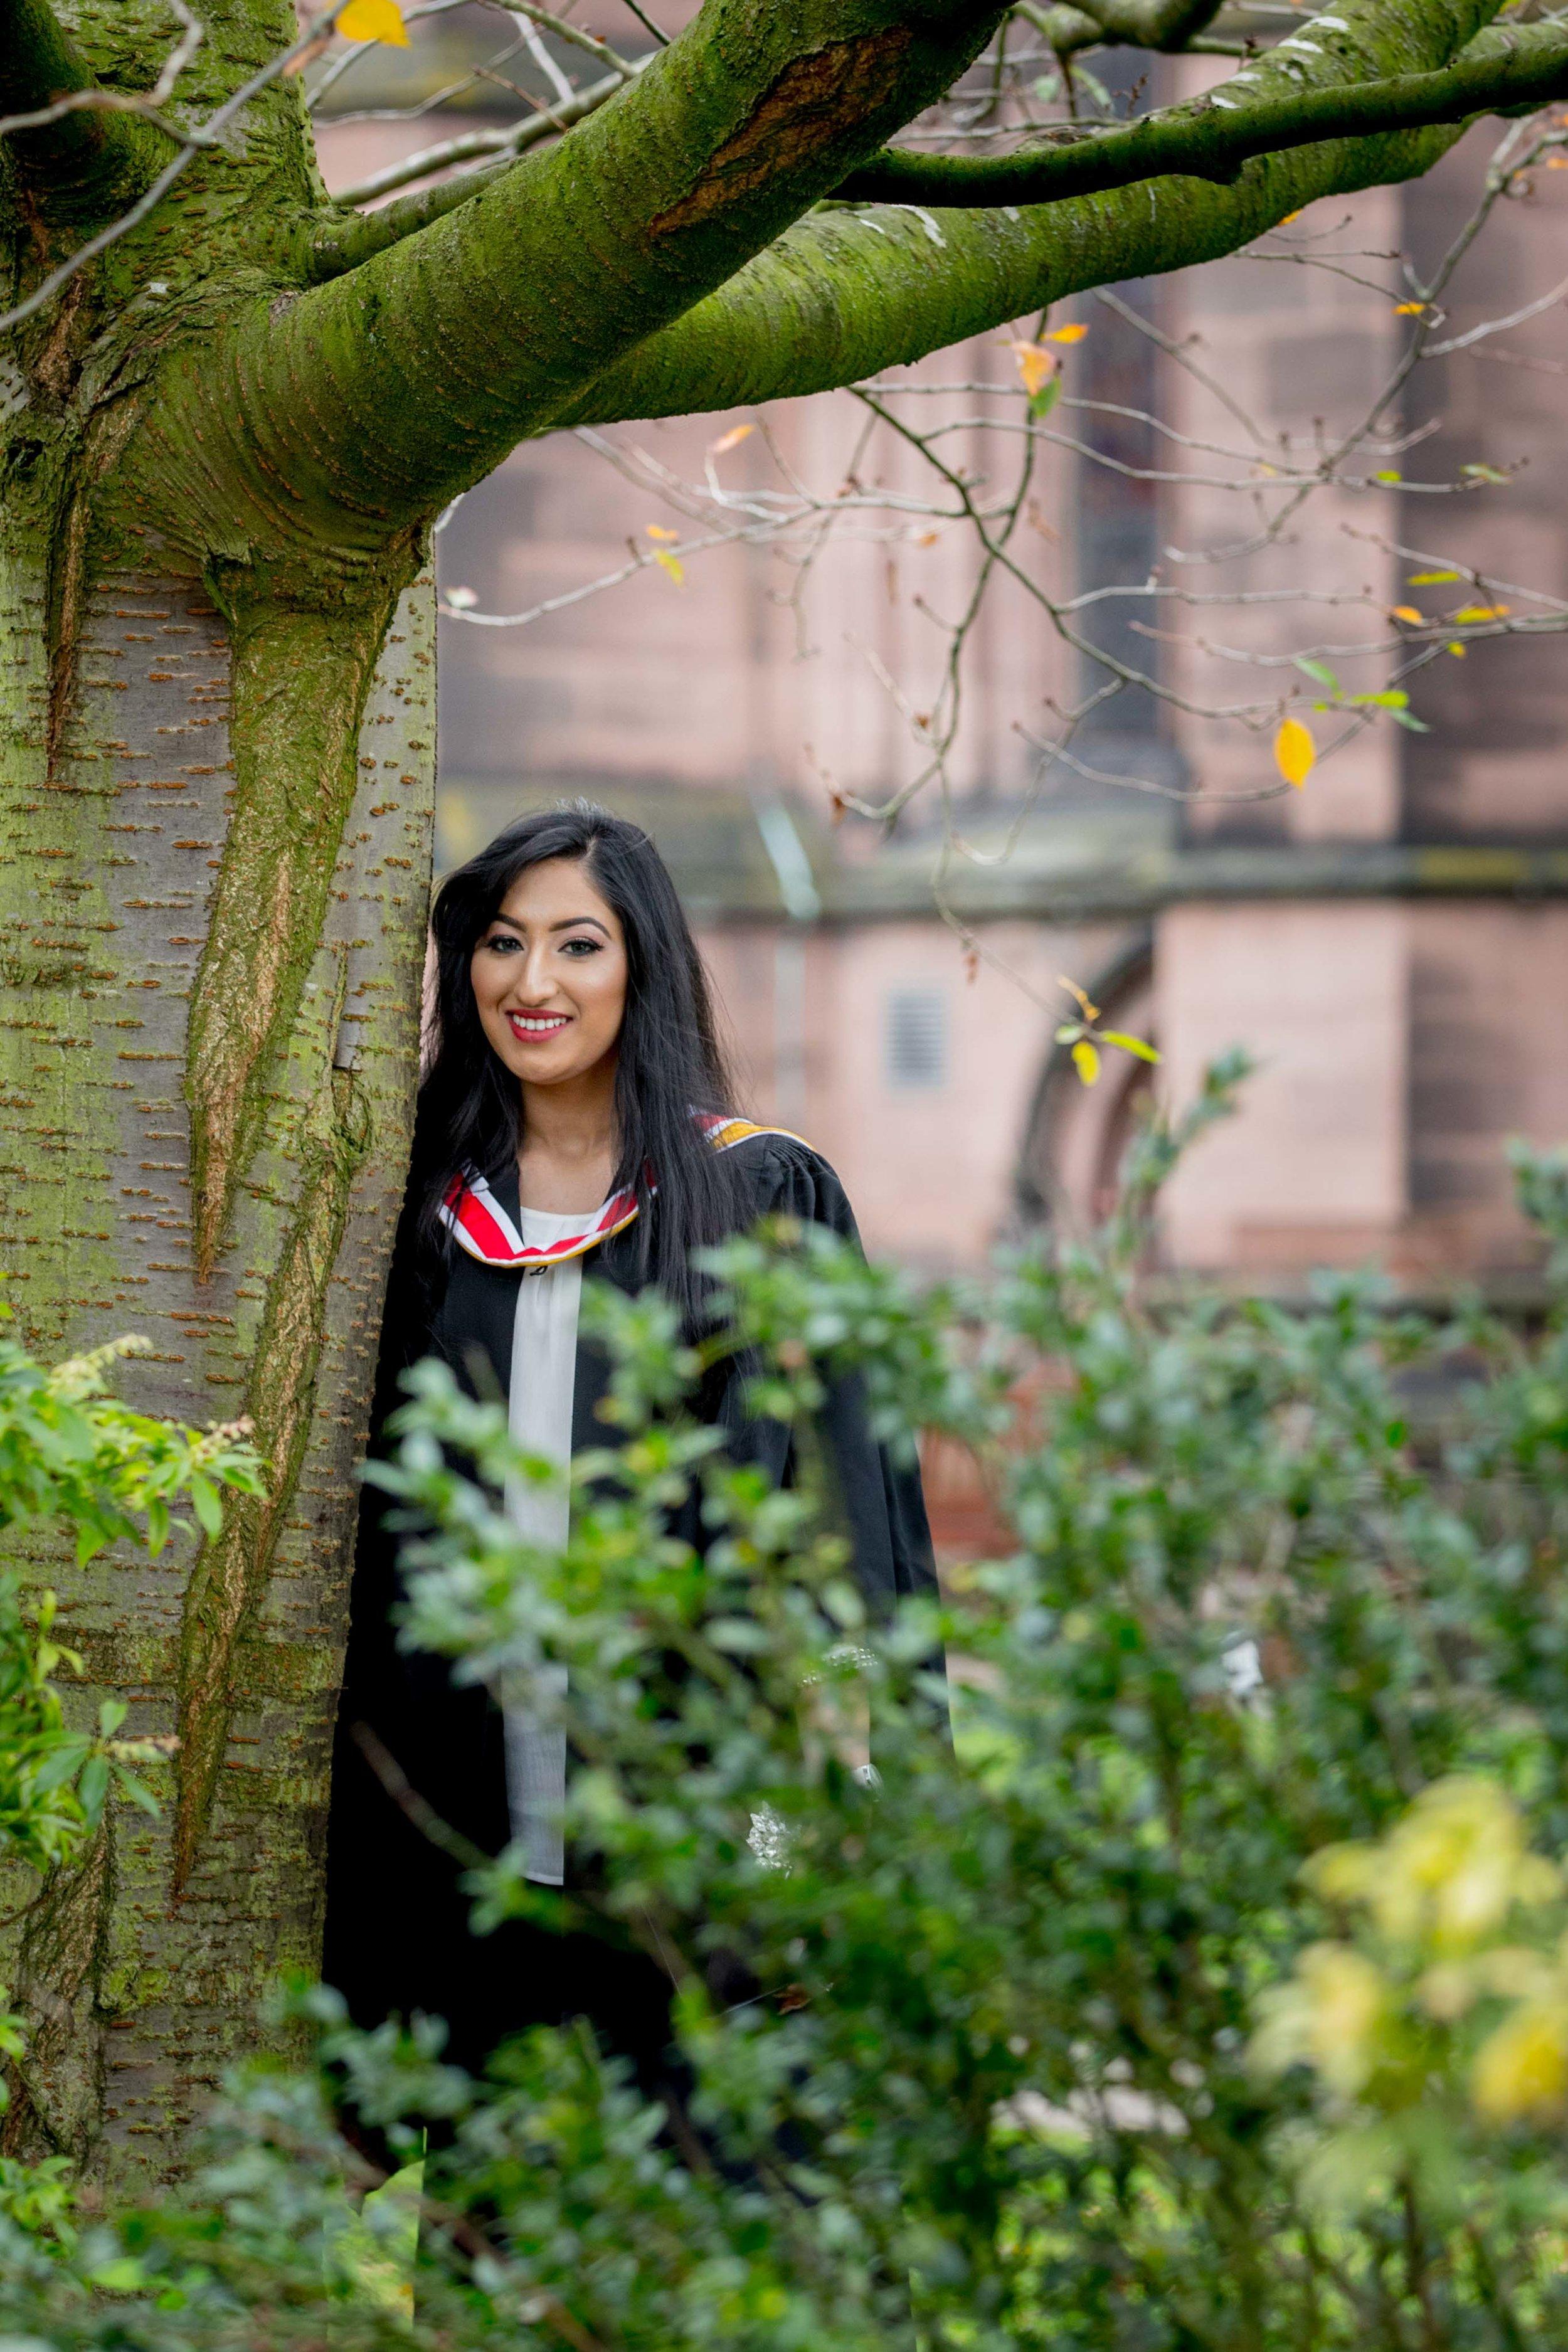 chester-university-graduation-ceremony-photography-photoshoot-graduation-photographer-Bristol-London-Cardiff-Birmingham-Chester-Natalia-smith-photography-7.jpg